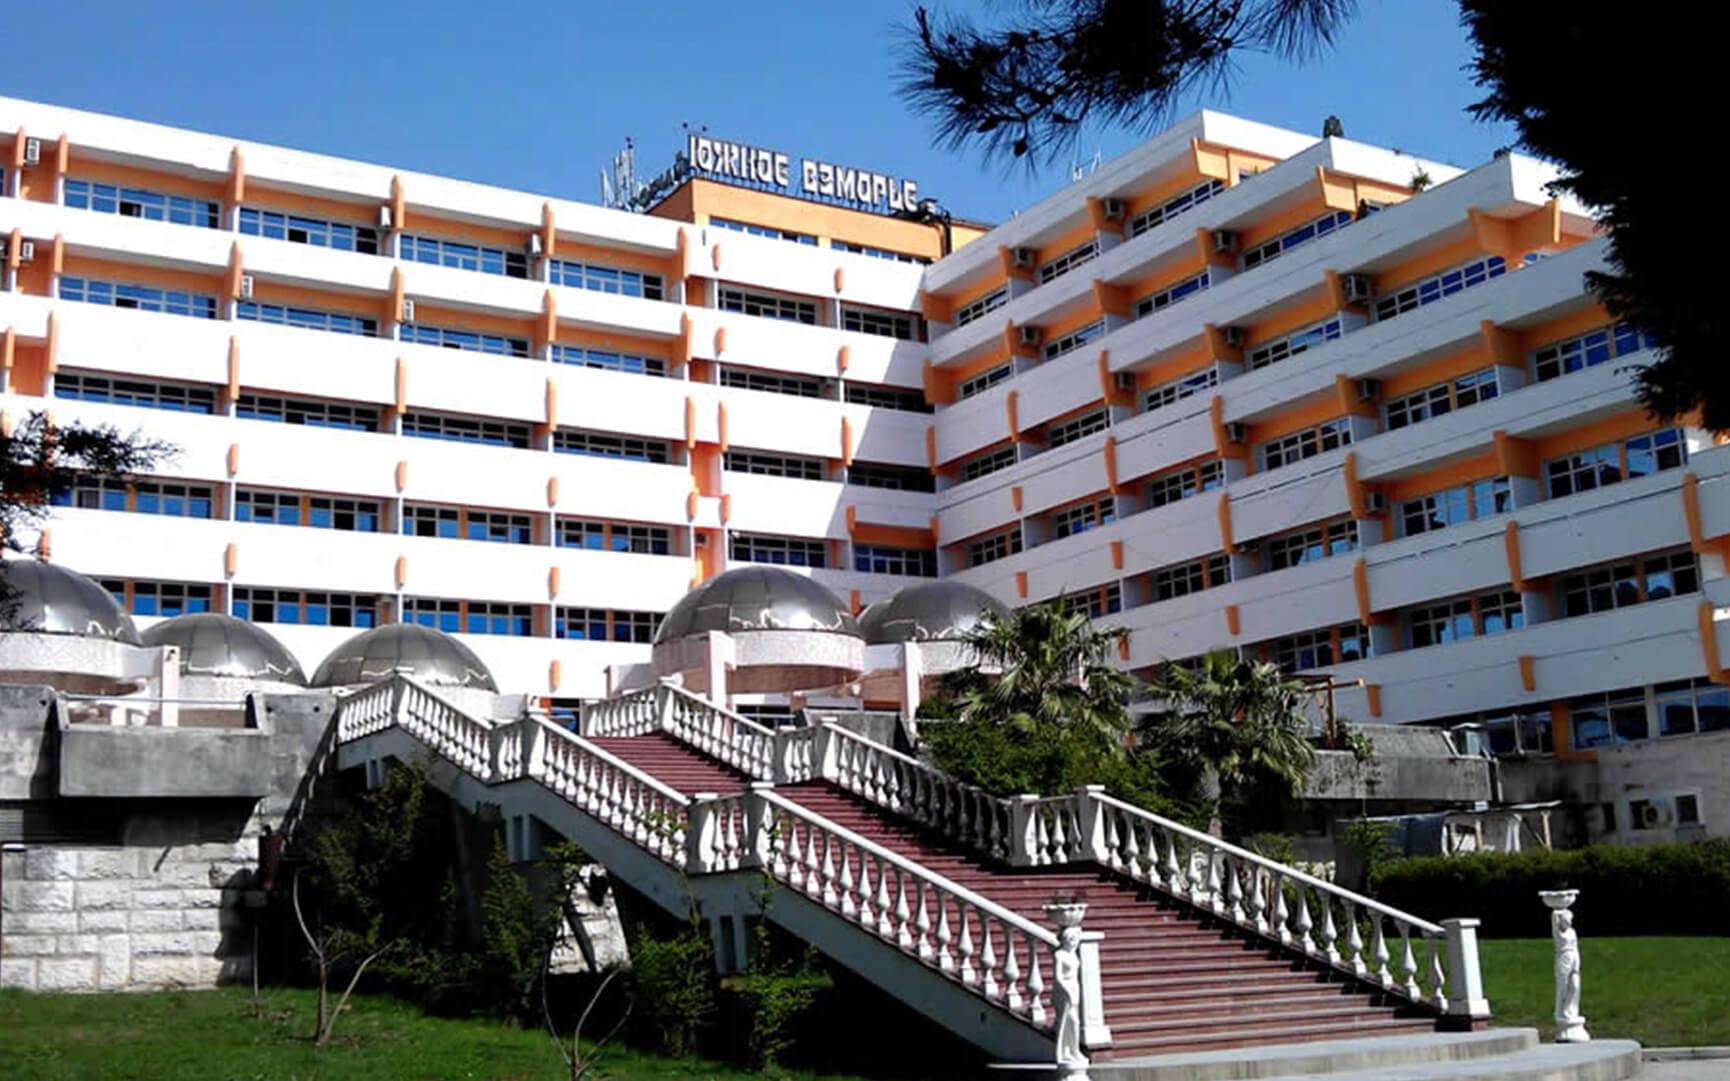 sochi-sanatorij-yuzhnoe-vzmore-0